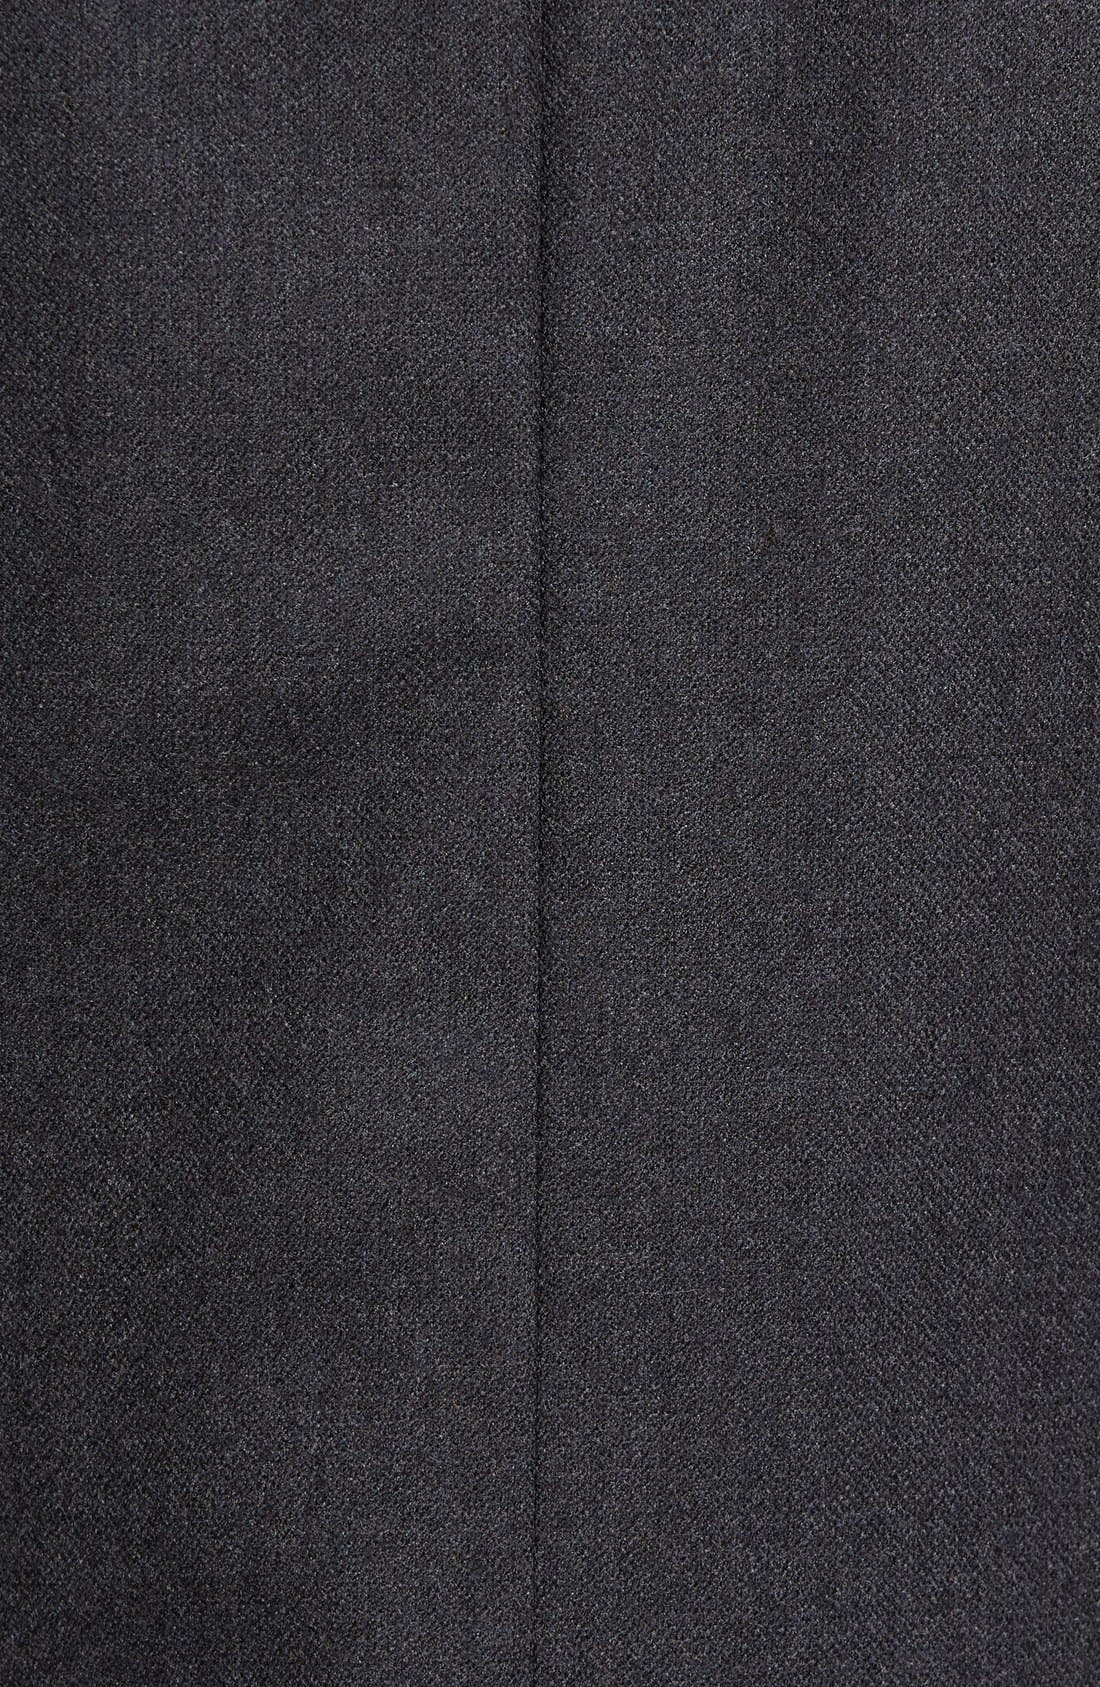 Classic Fit Wool & Cashmere Blazer,                             Alternate thumbnail 10, color,